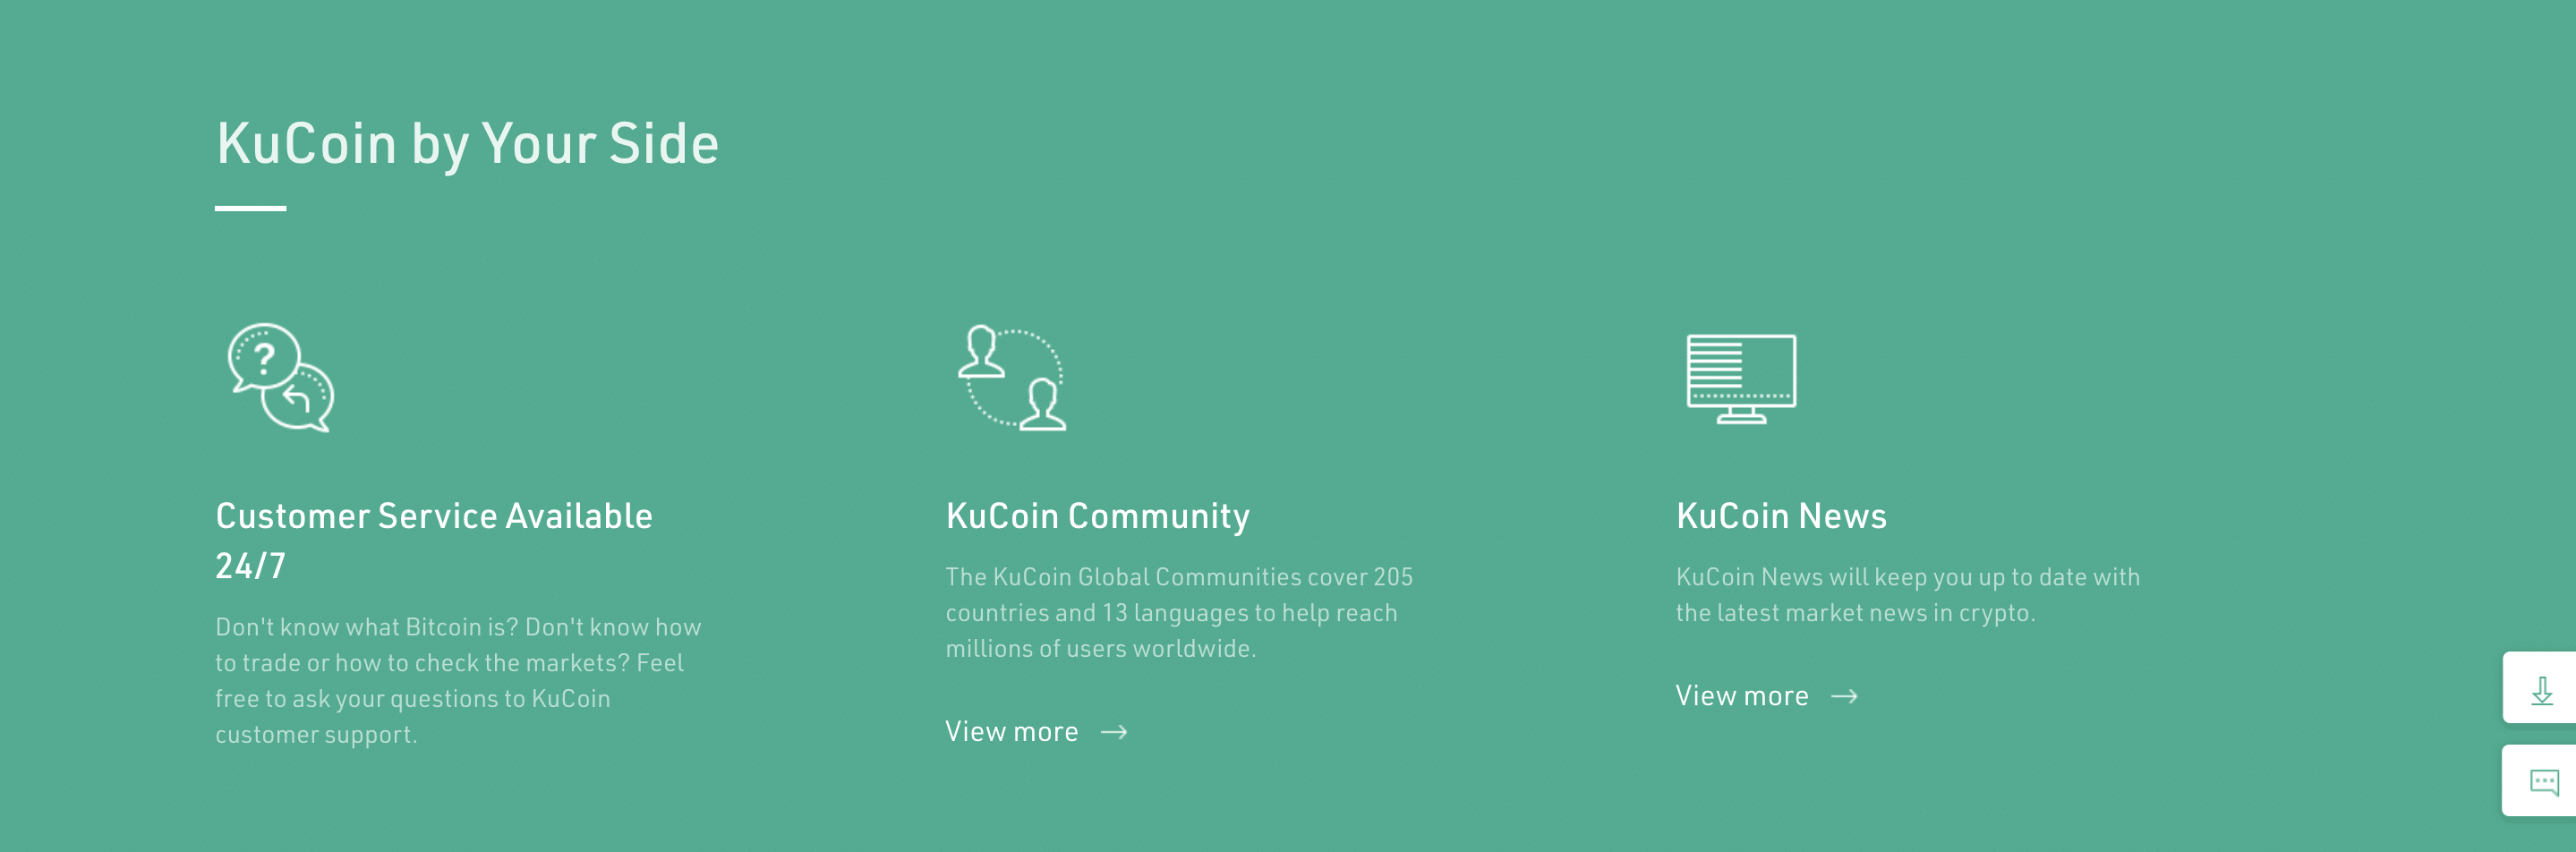 Kucoin Support